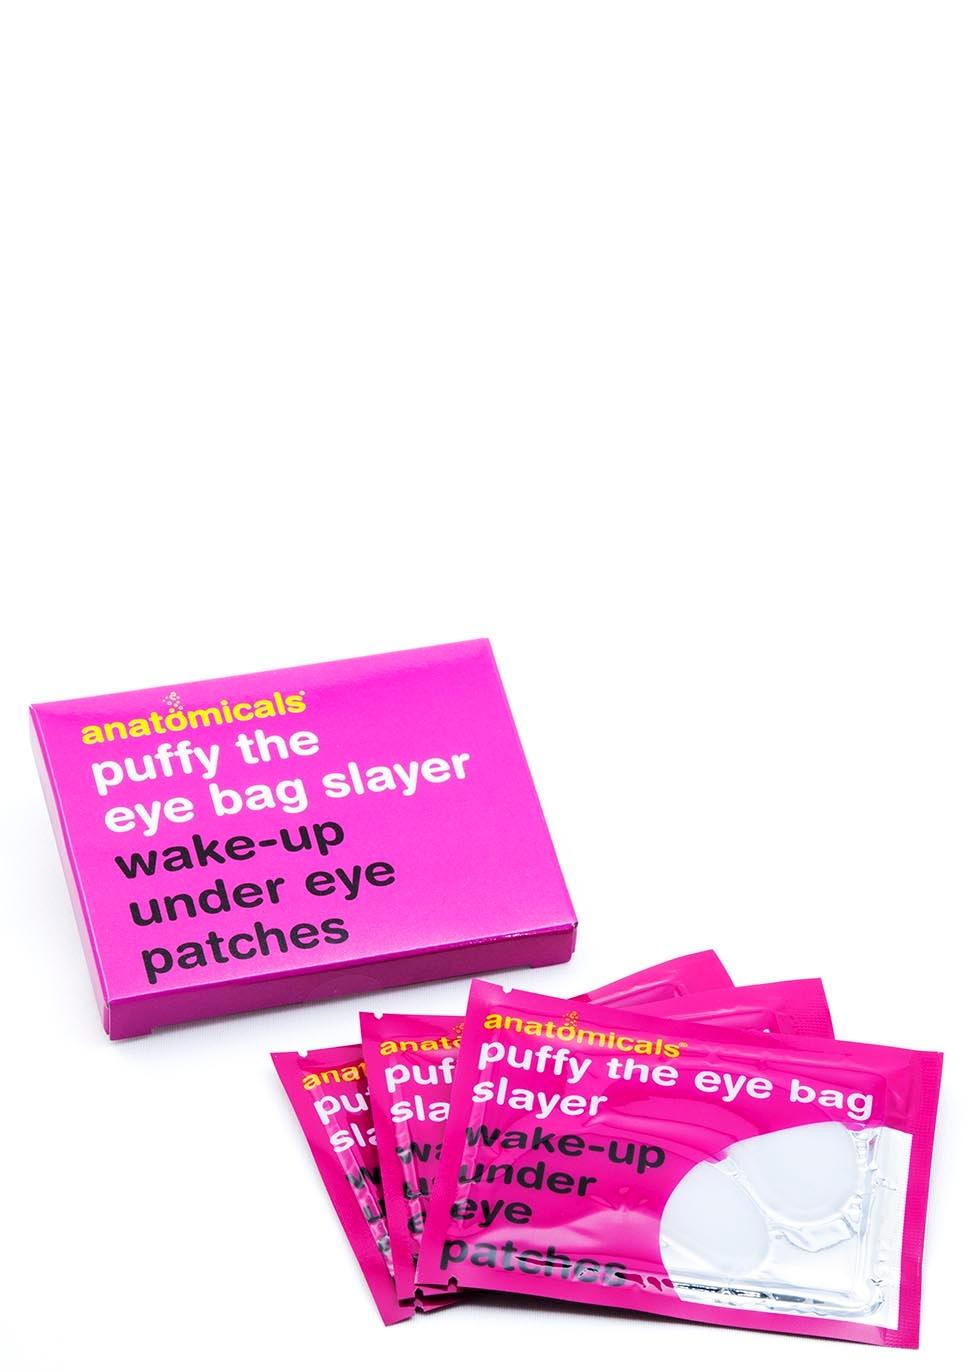 Puffy The Eye Bag Slayer Under Eye Patches